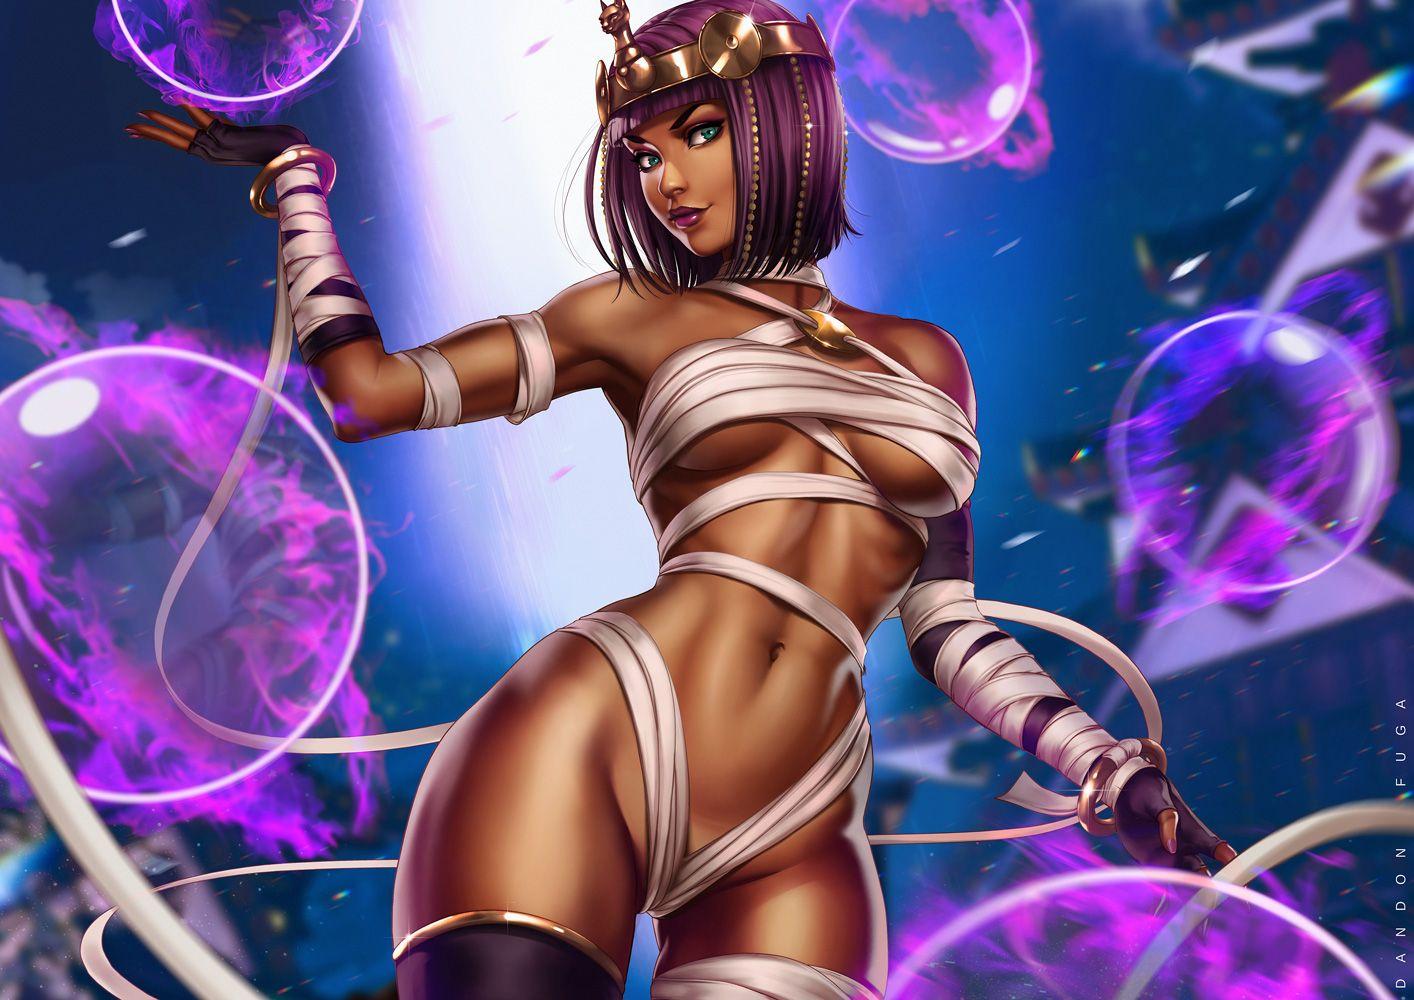 Alita Battle Angel Nude Anime Cgi Porn pinshogun on video games | street fighter, incase art